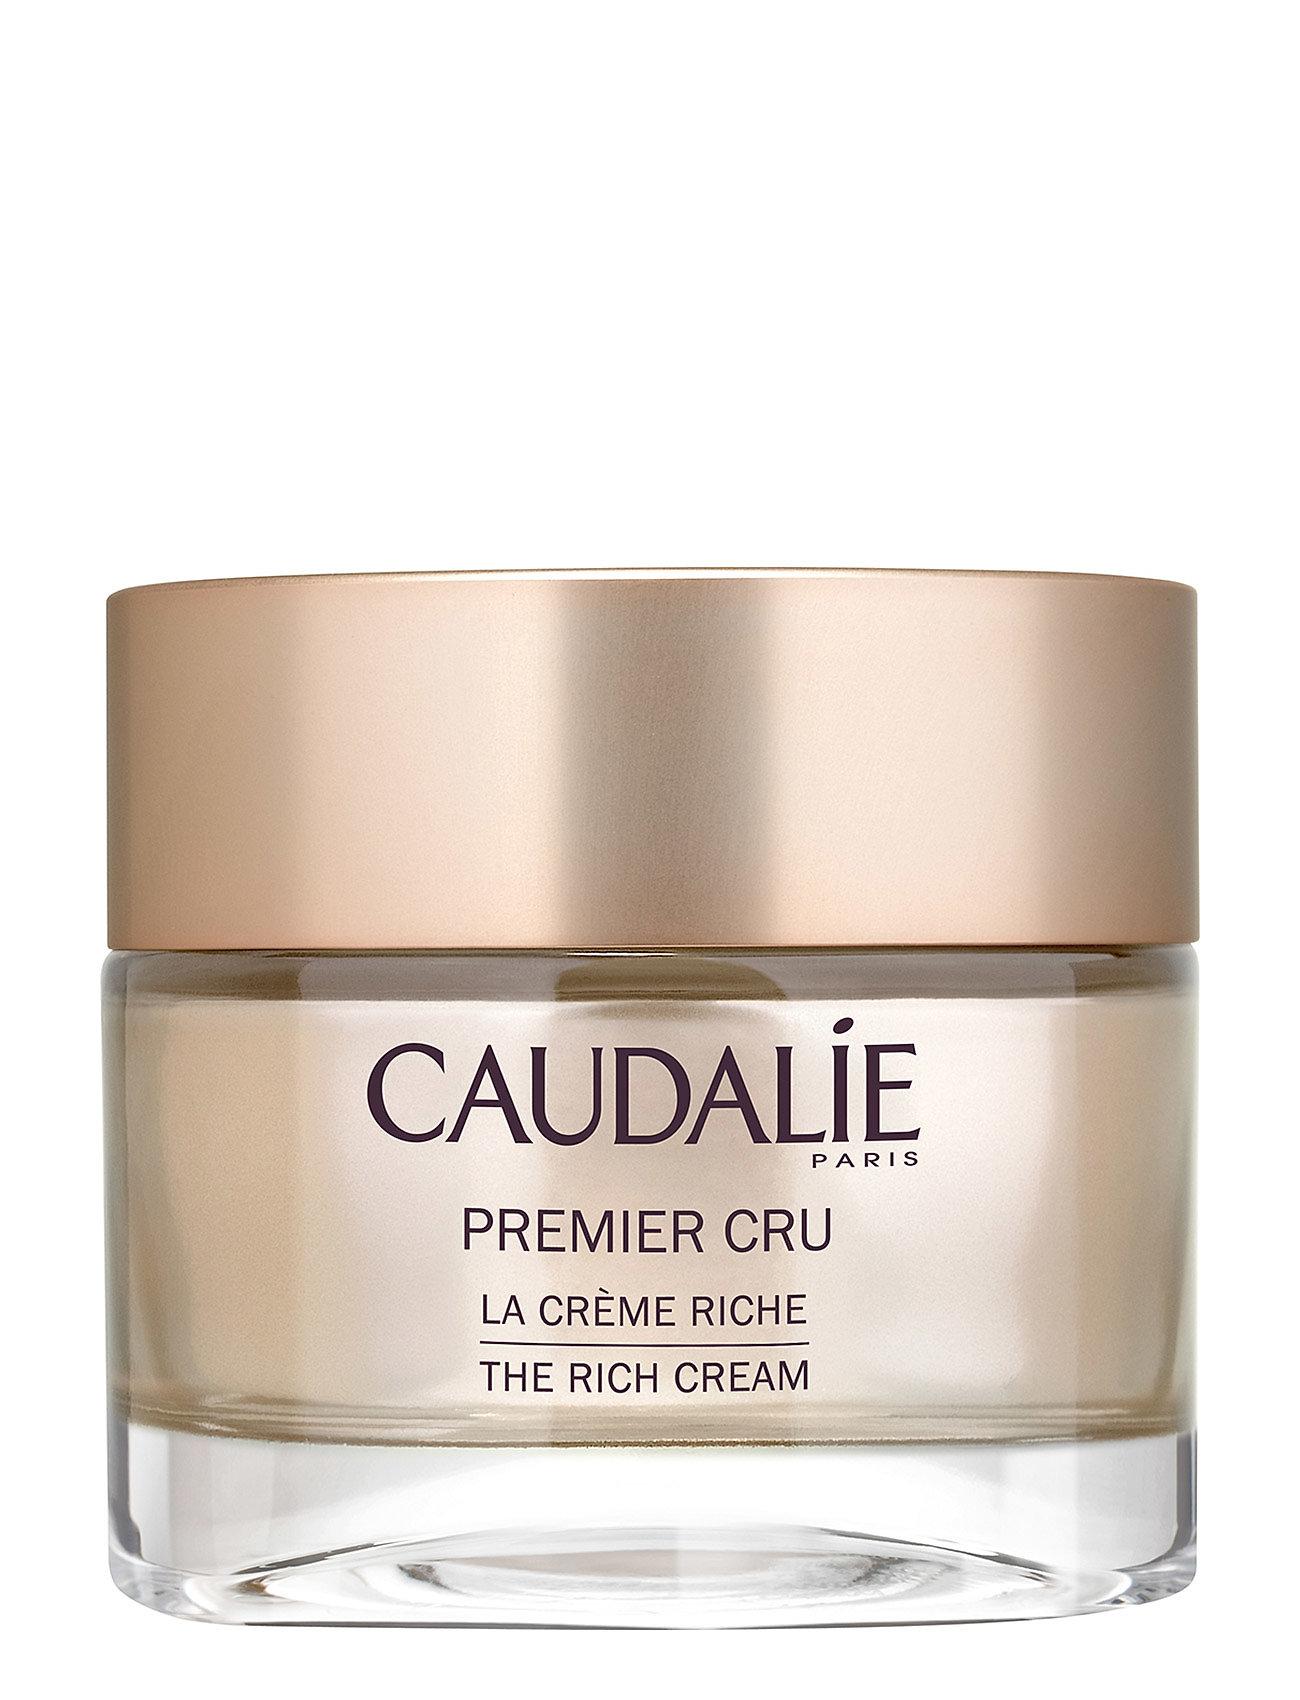 CAUDALIE Premier Cru the Rich Cream - CLEAR